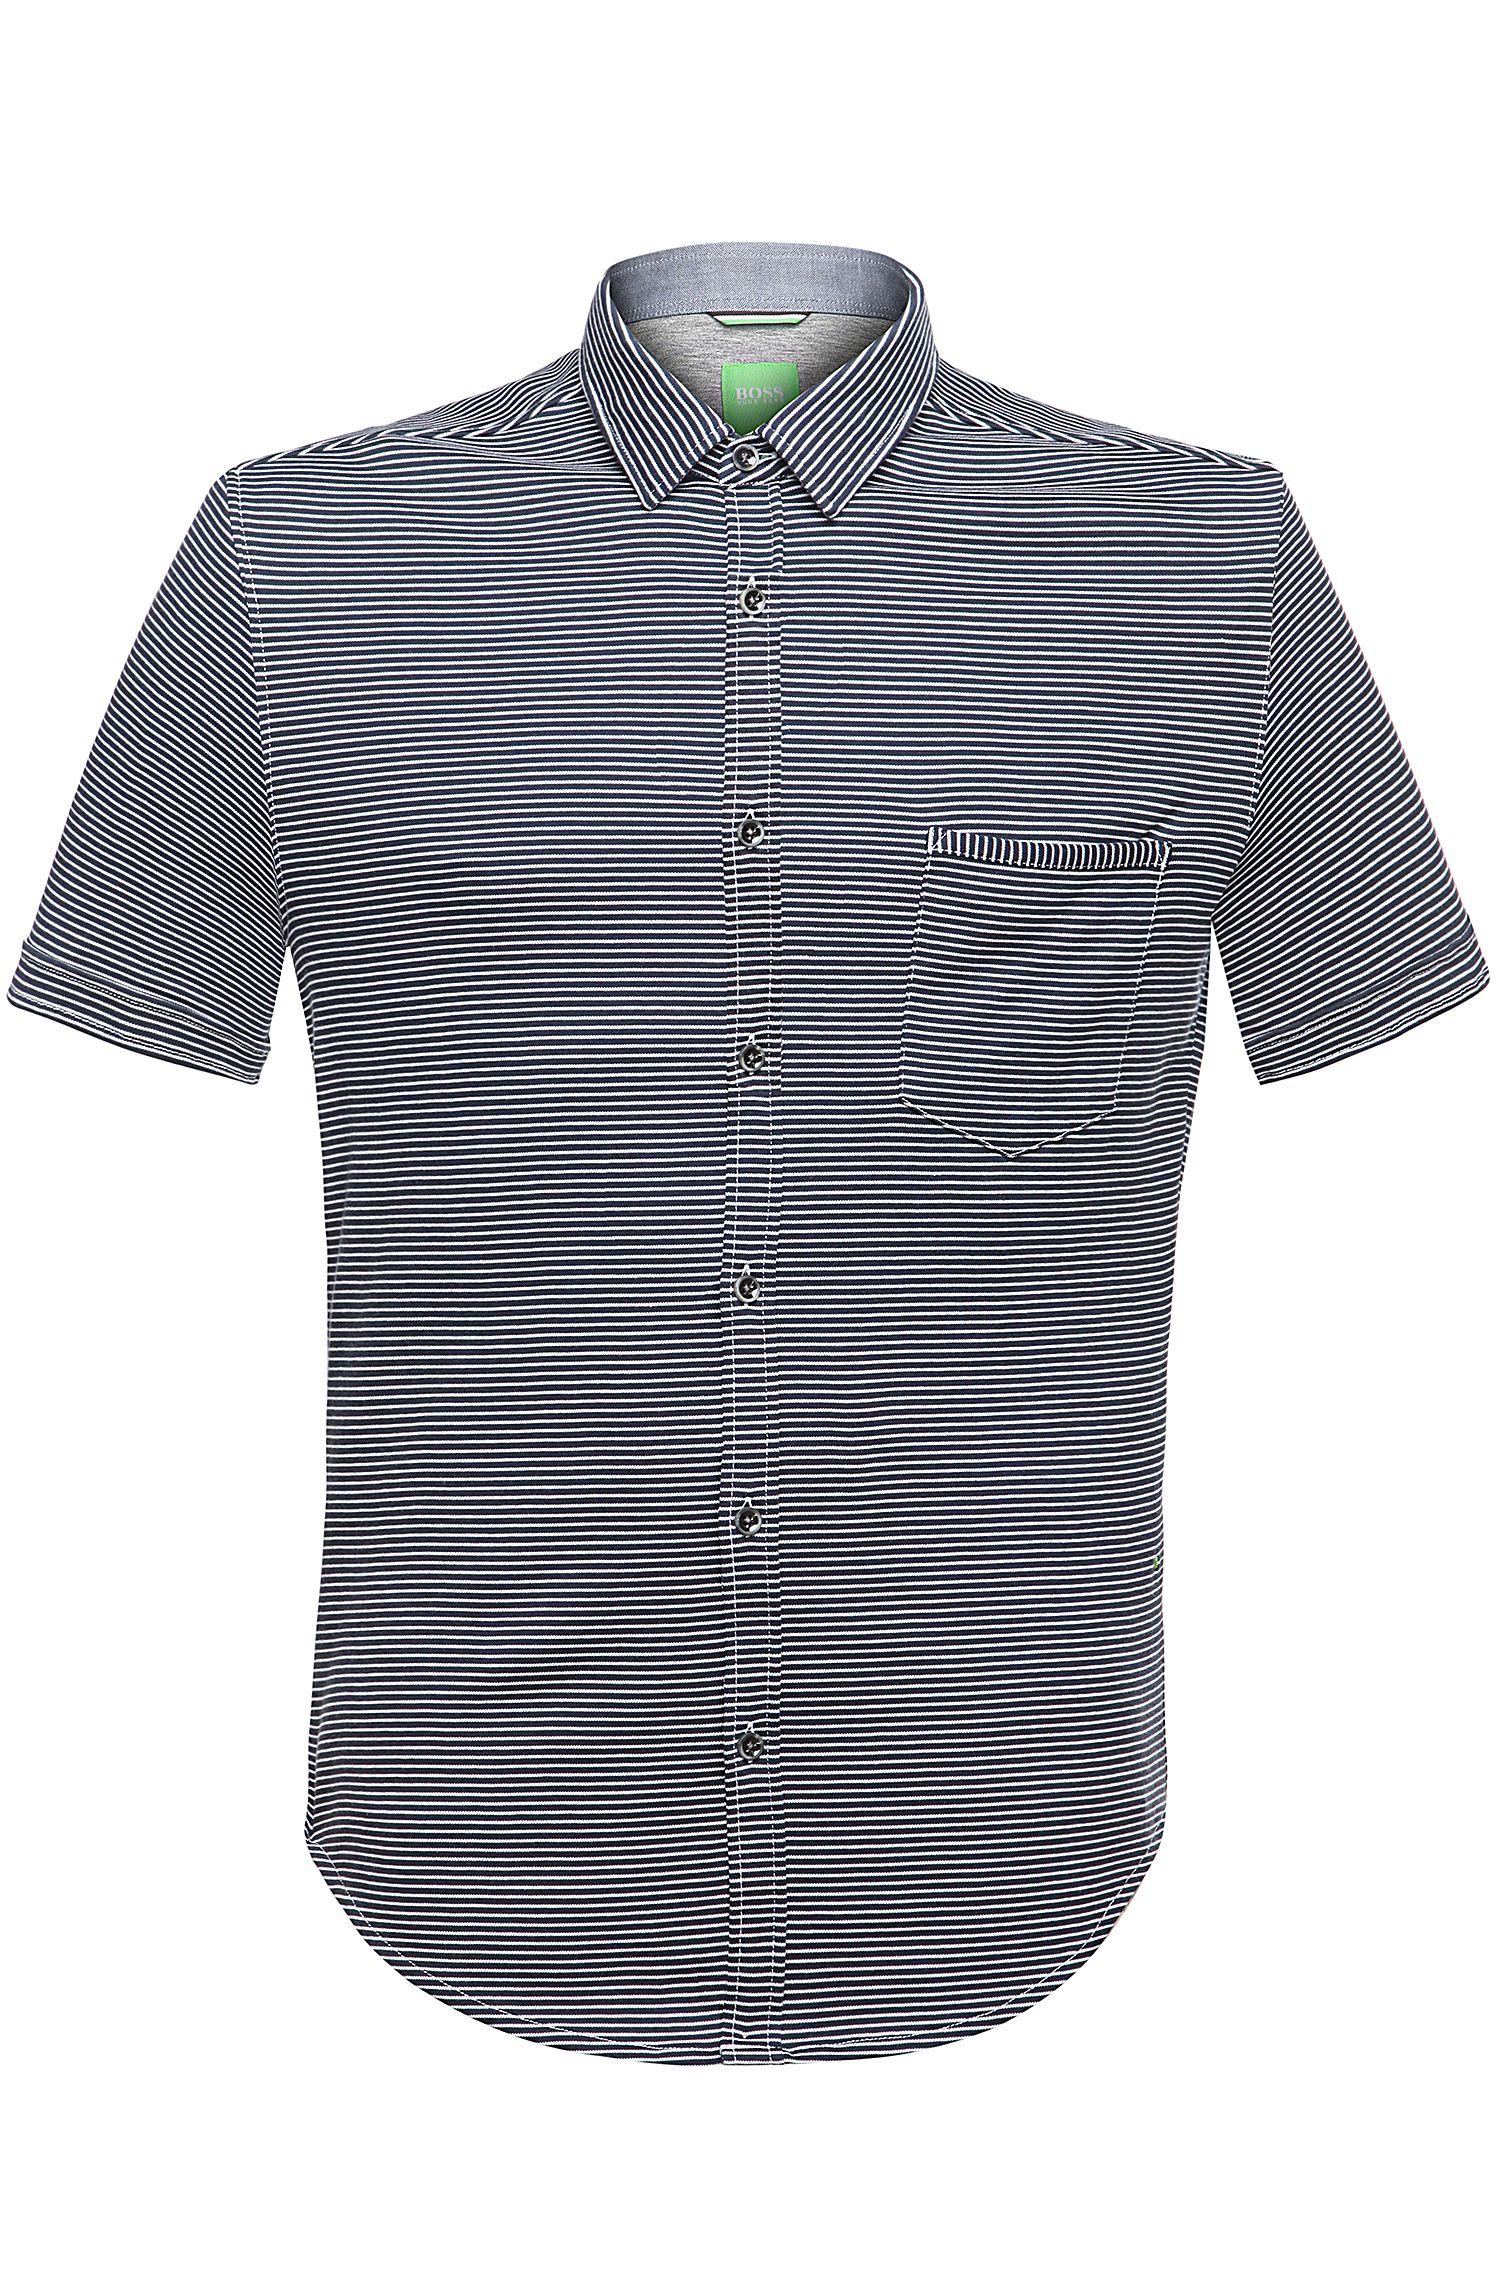 'Bascelino' | Slim Fit, Cotton Knit Button Down Shirt